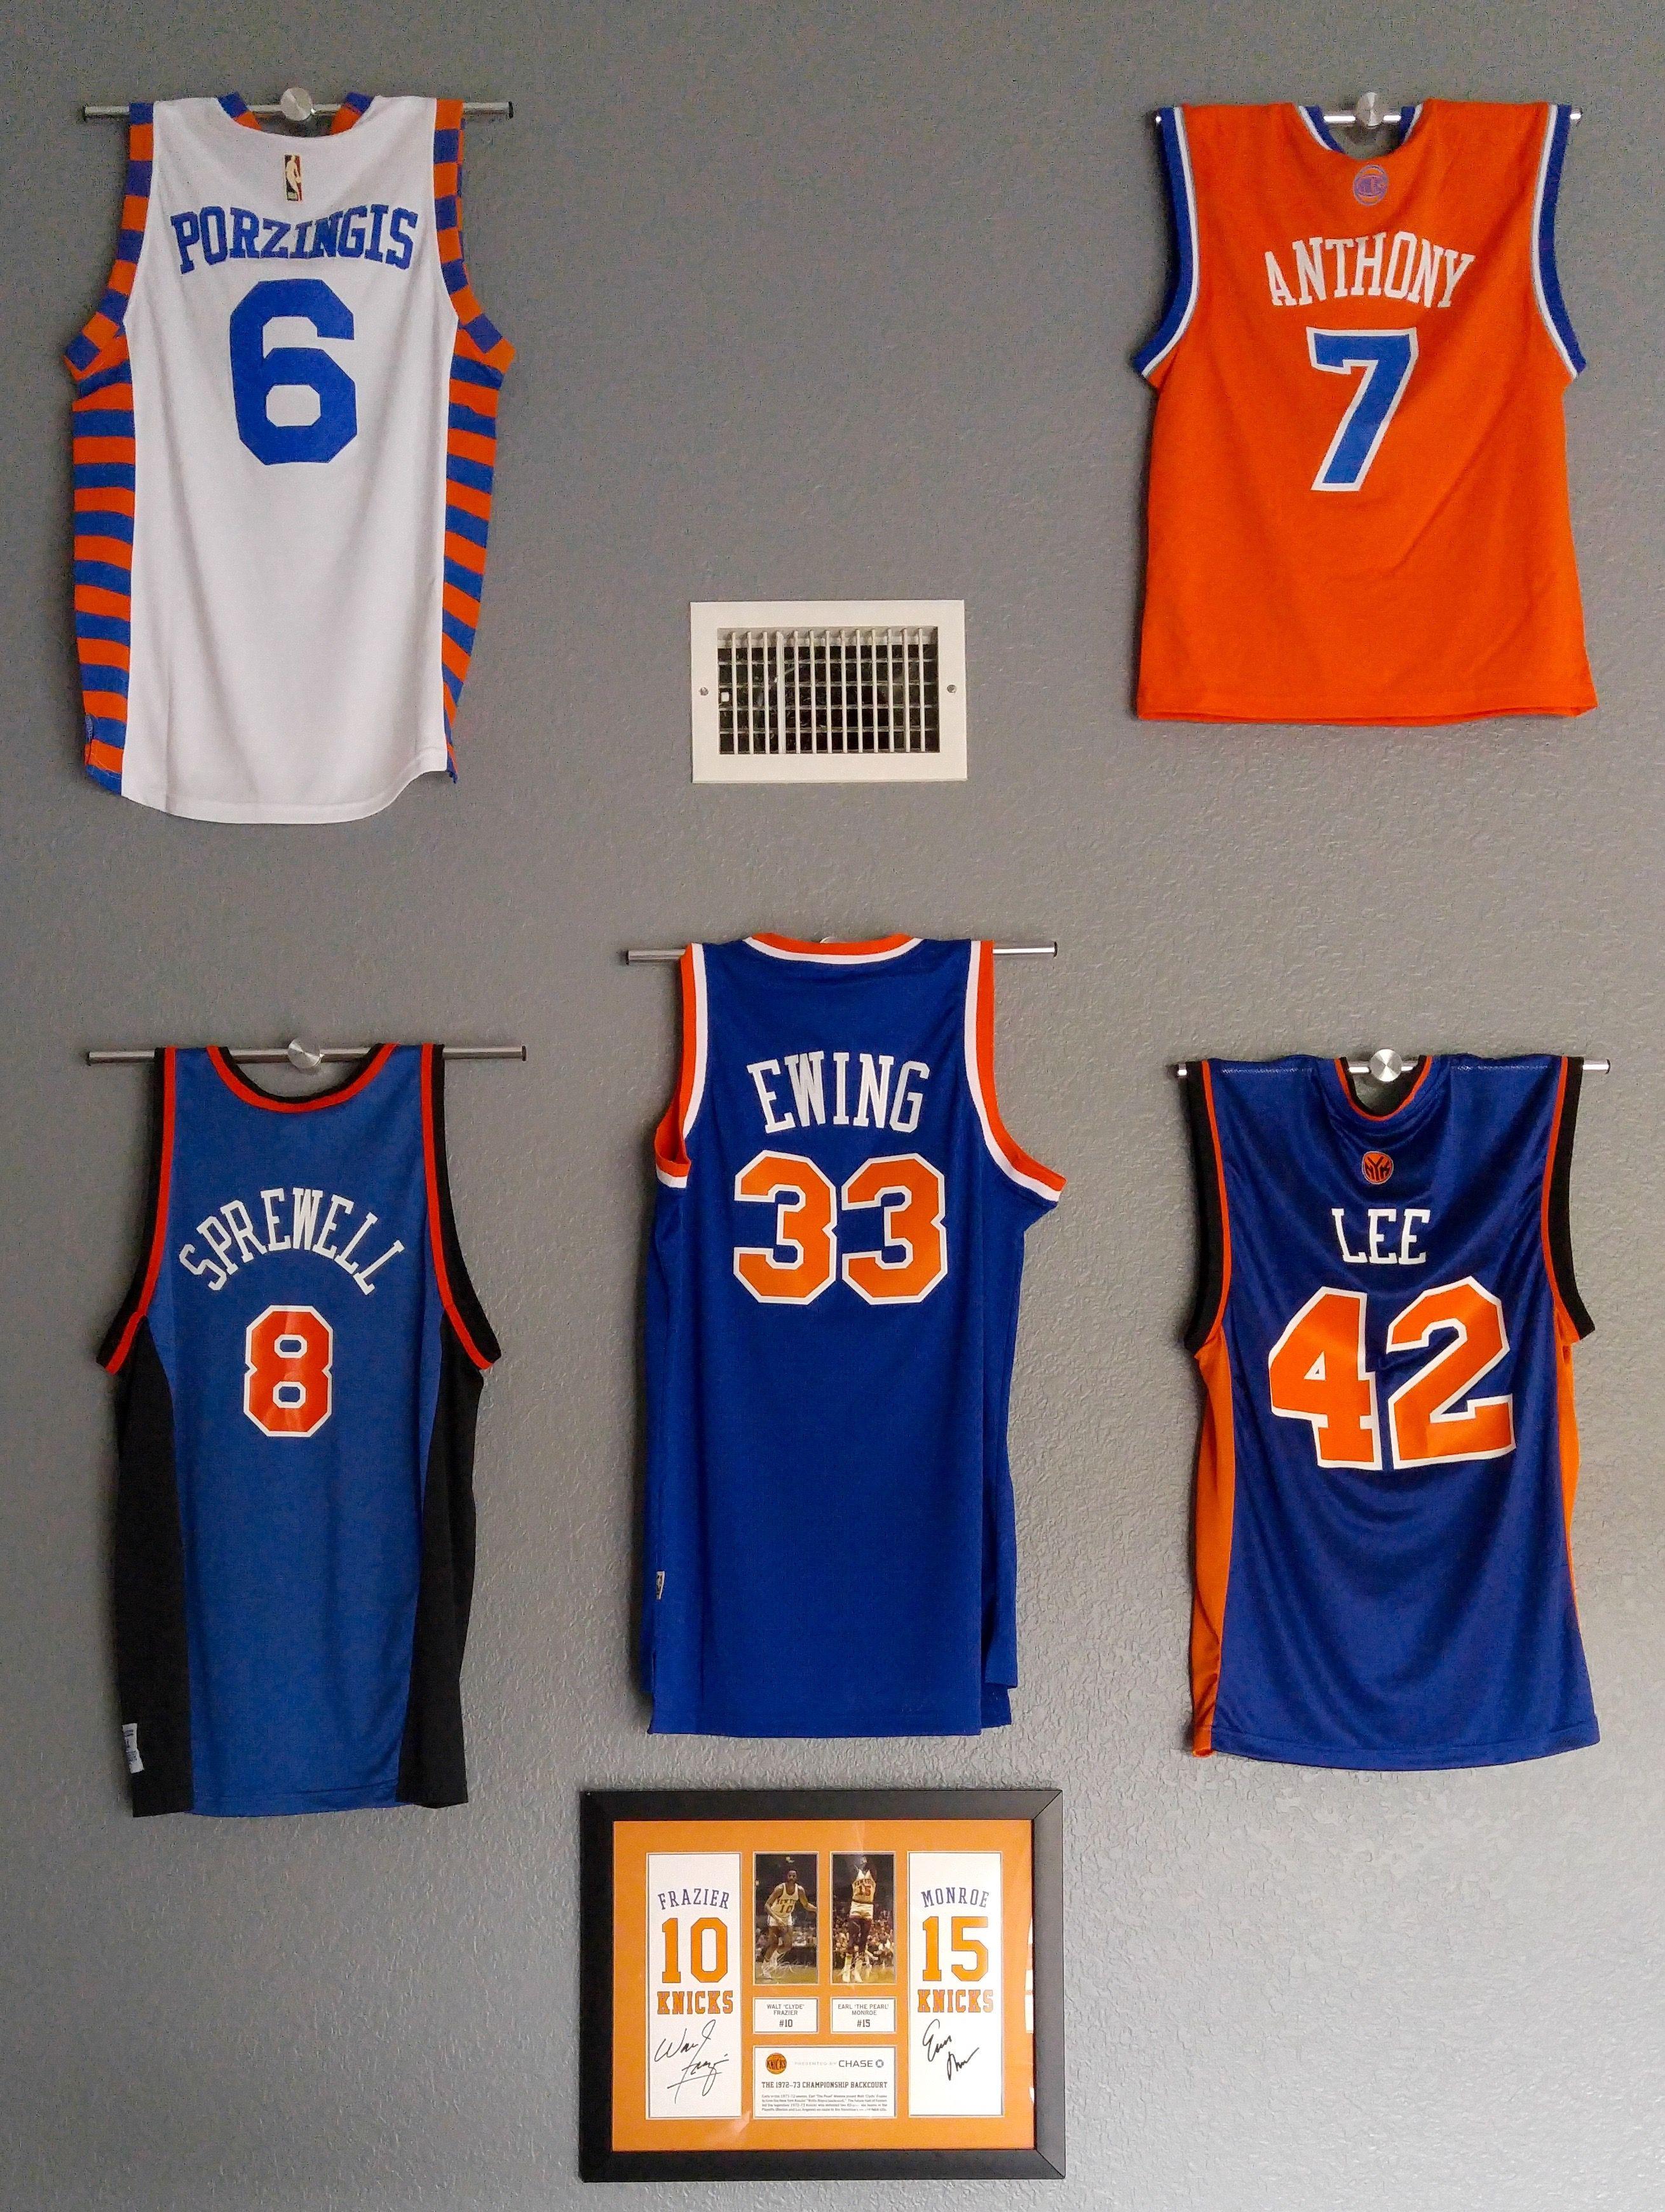 Knicks Wall of Fame | Man Cave | Pinterest | Walls, Men ...